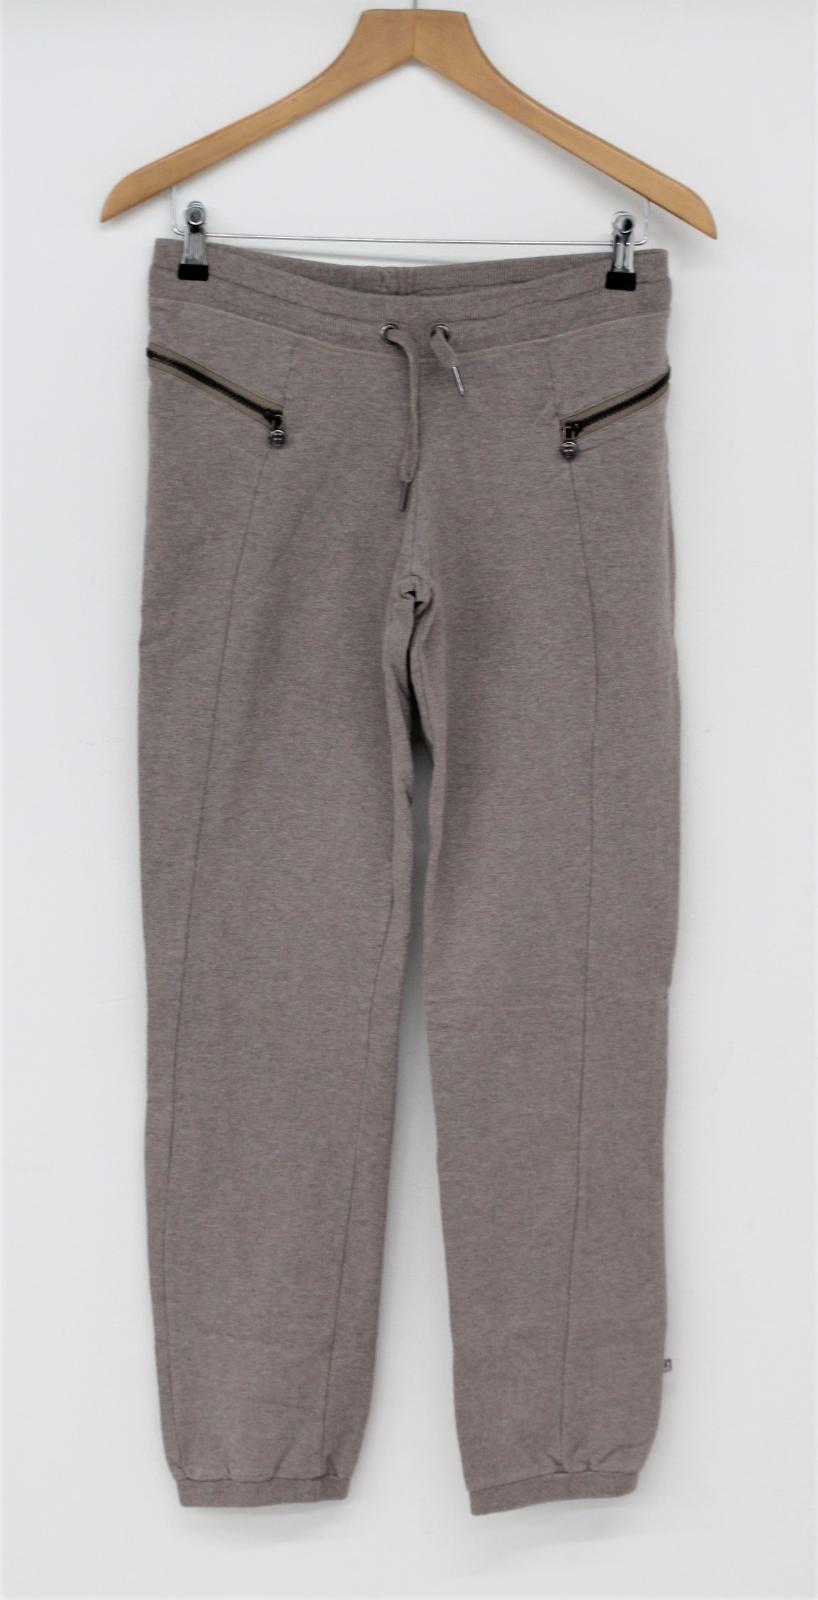 Sweaty-Betty-Damas-Malva-Mezcla-de-Algodon-Cintura-Elastica-Correr-Pantalones-S-W30 miniatura 2